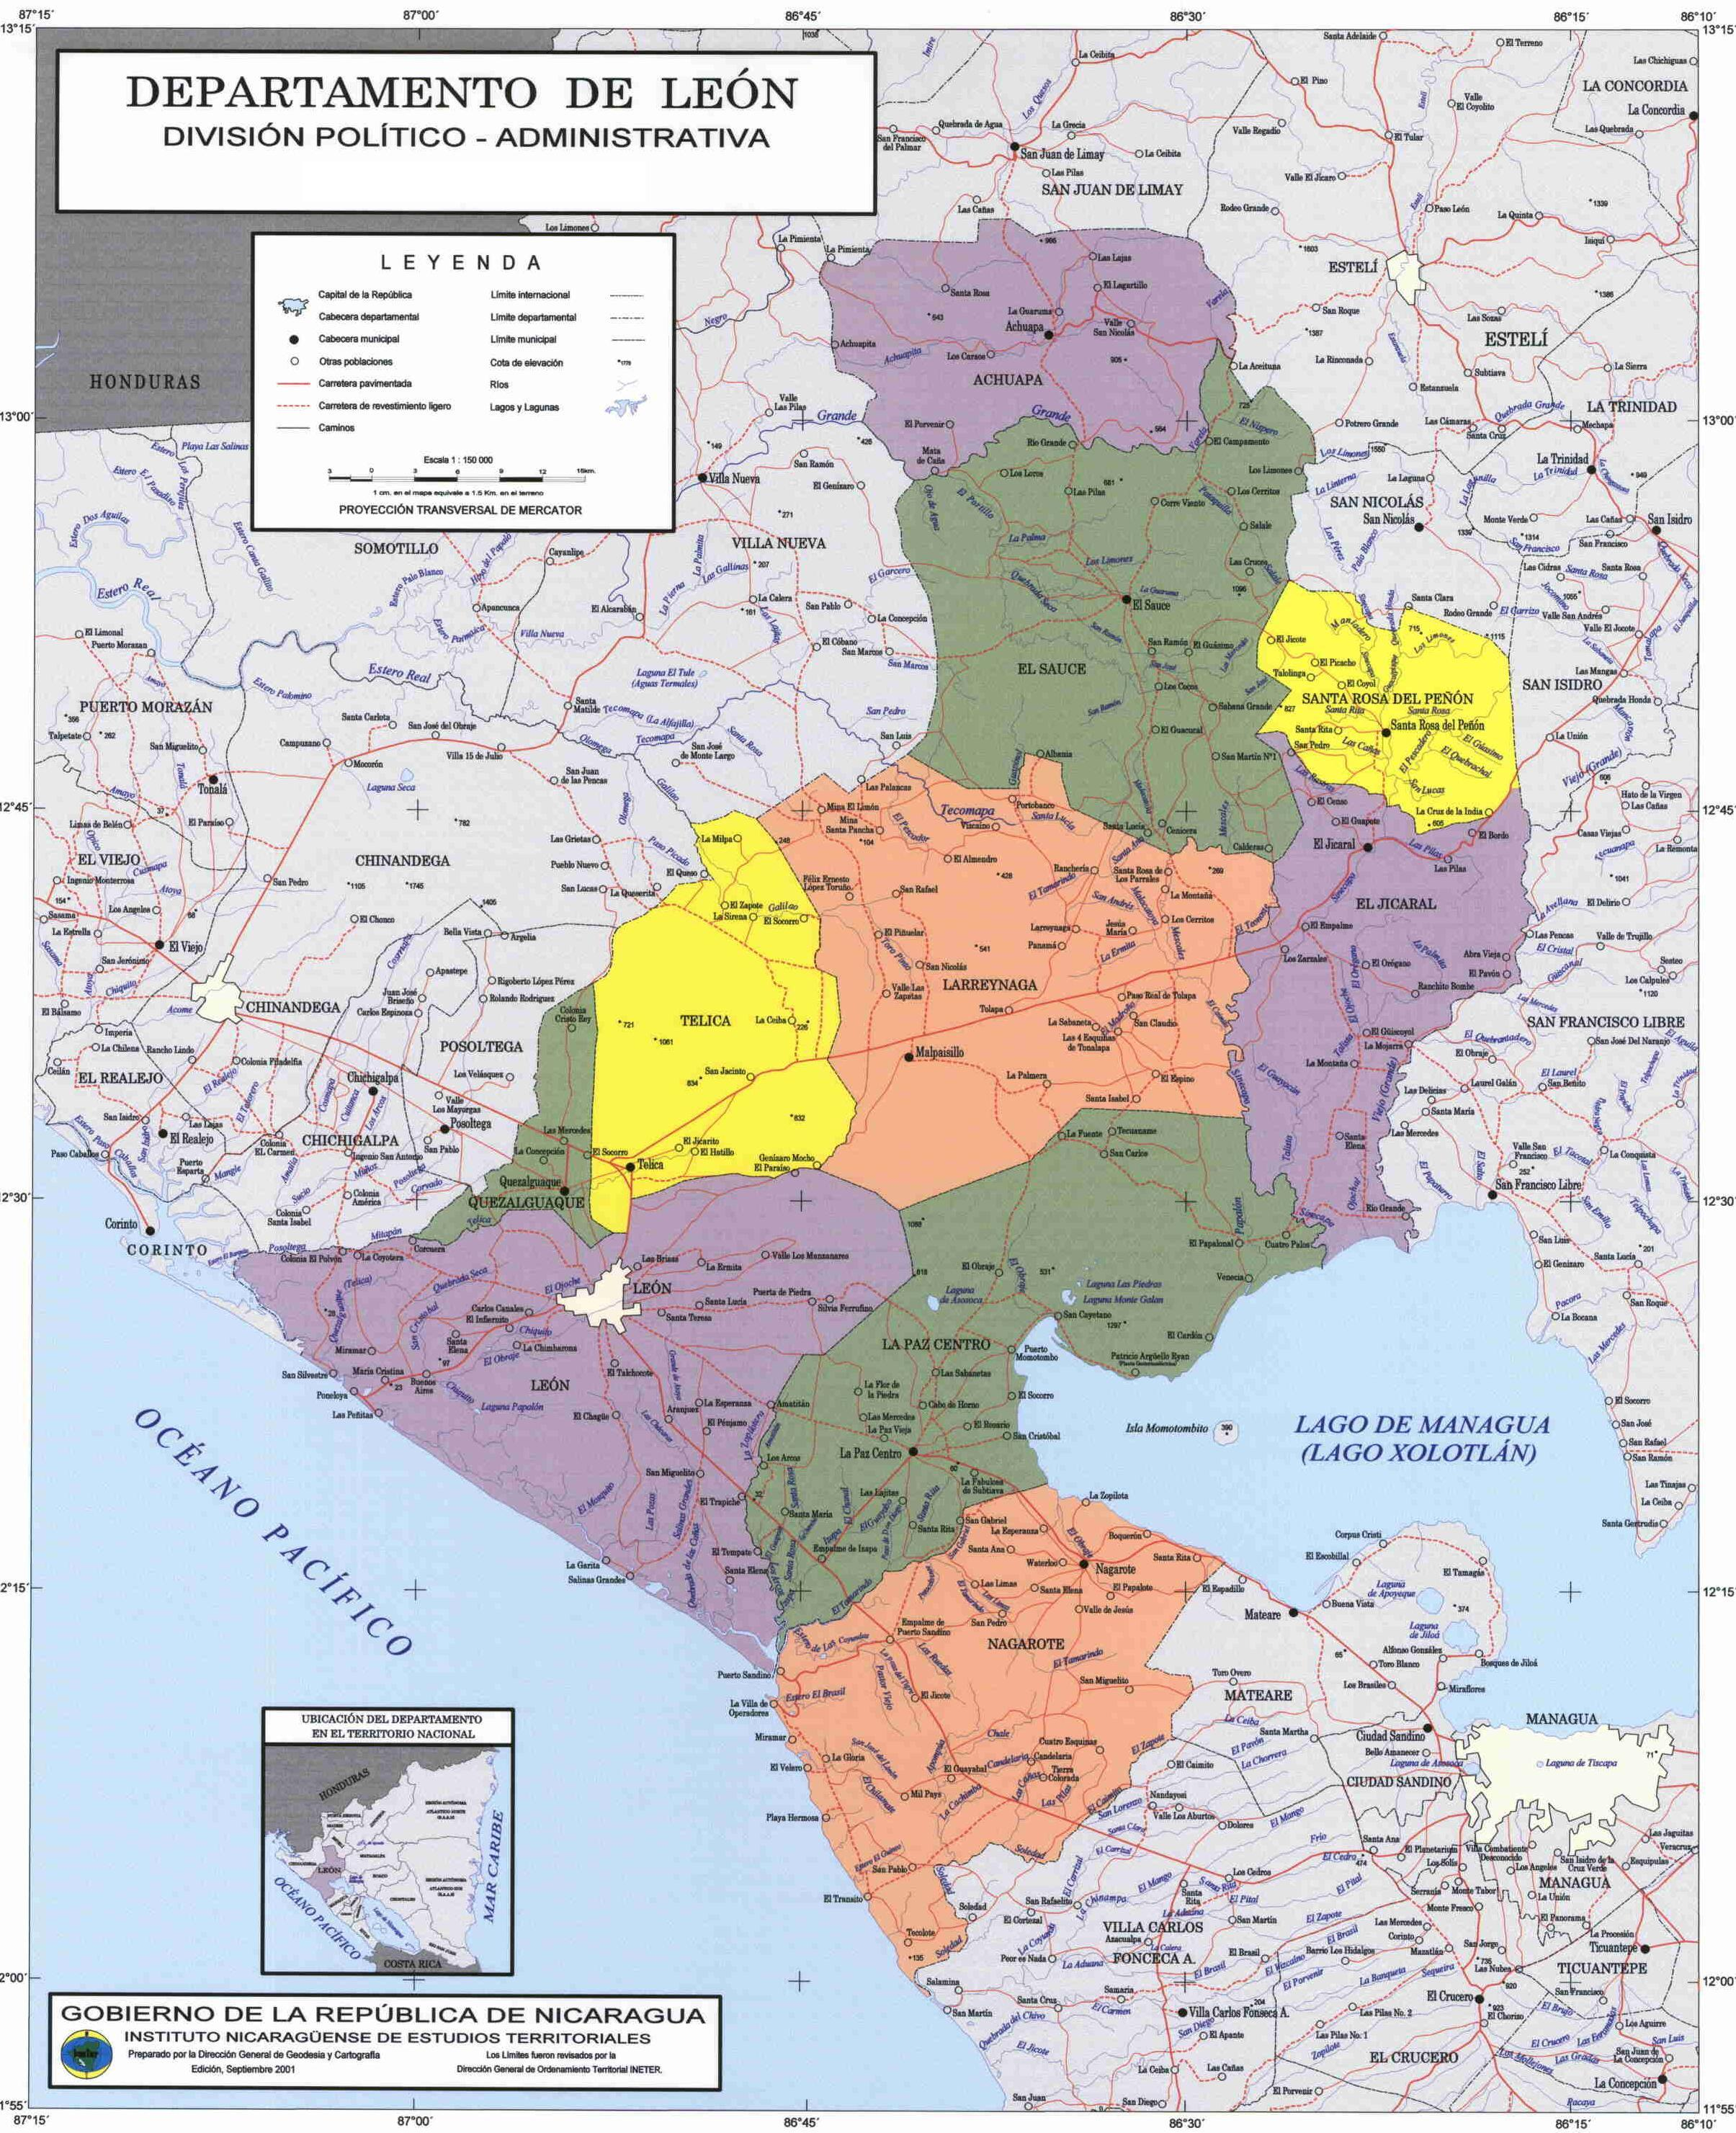 León Department Administrative Political Map, Nicaragua